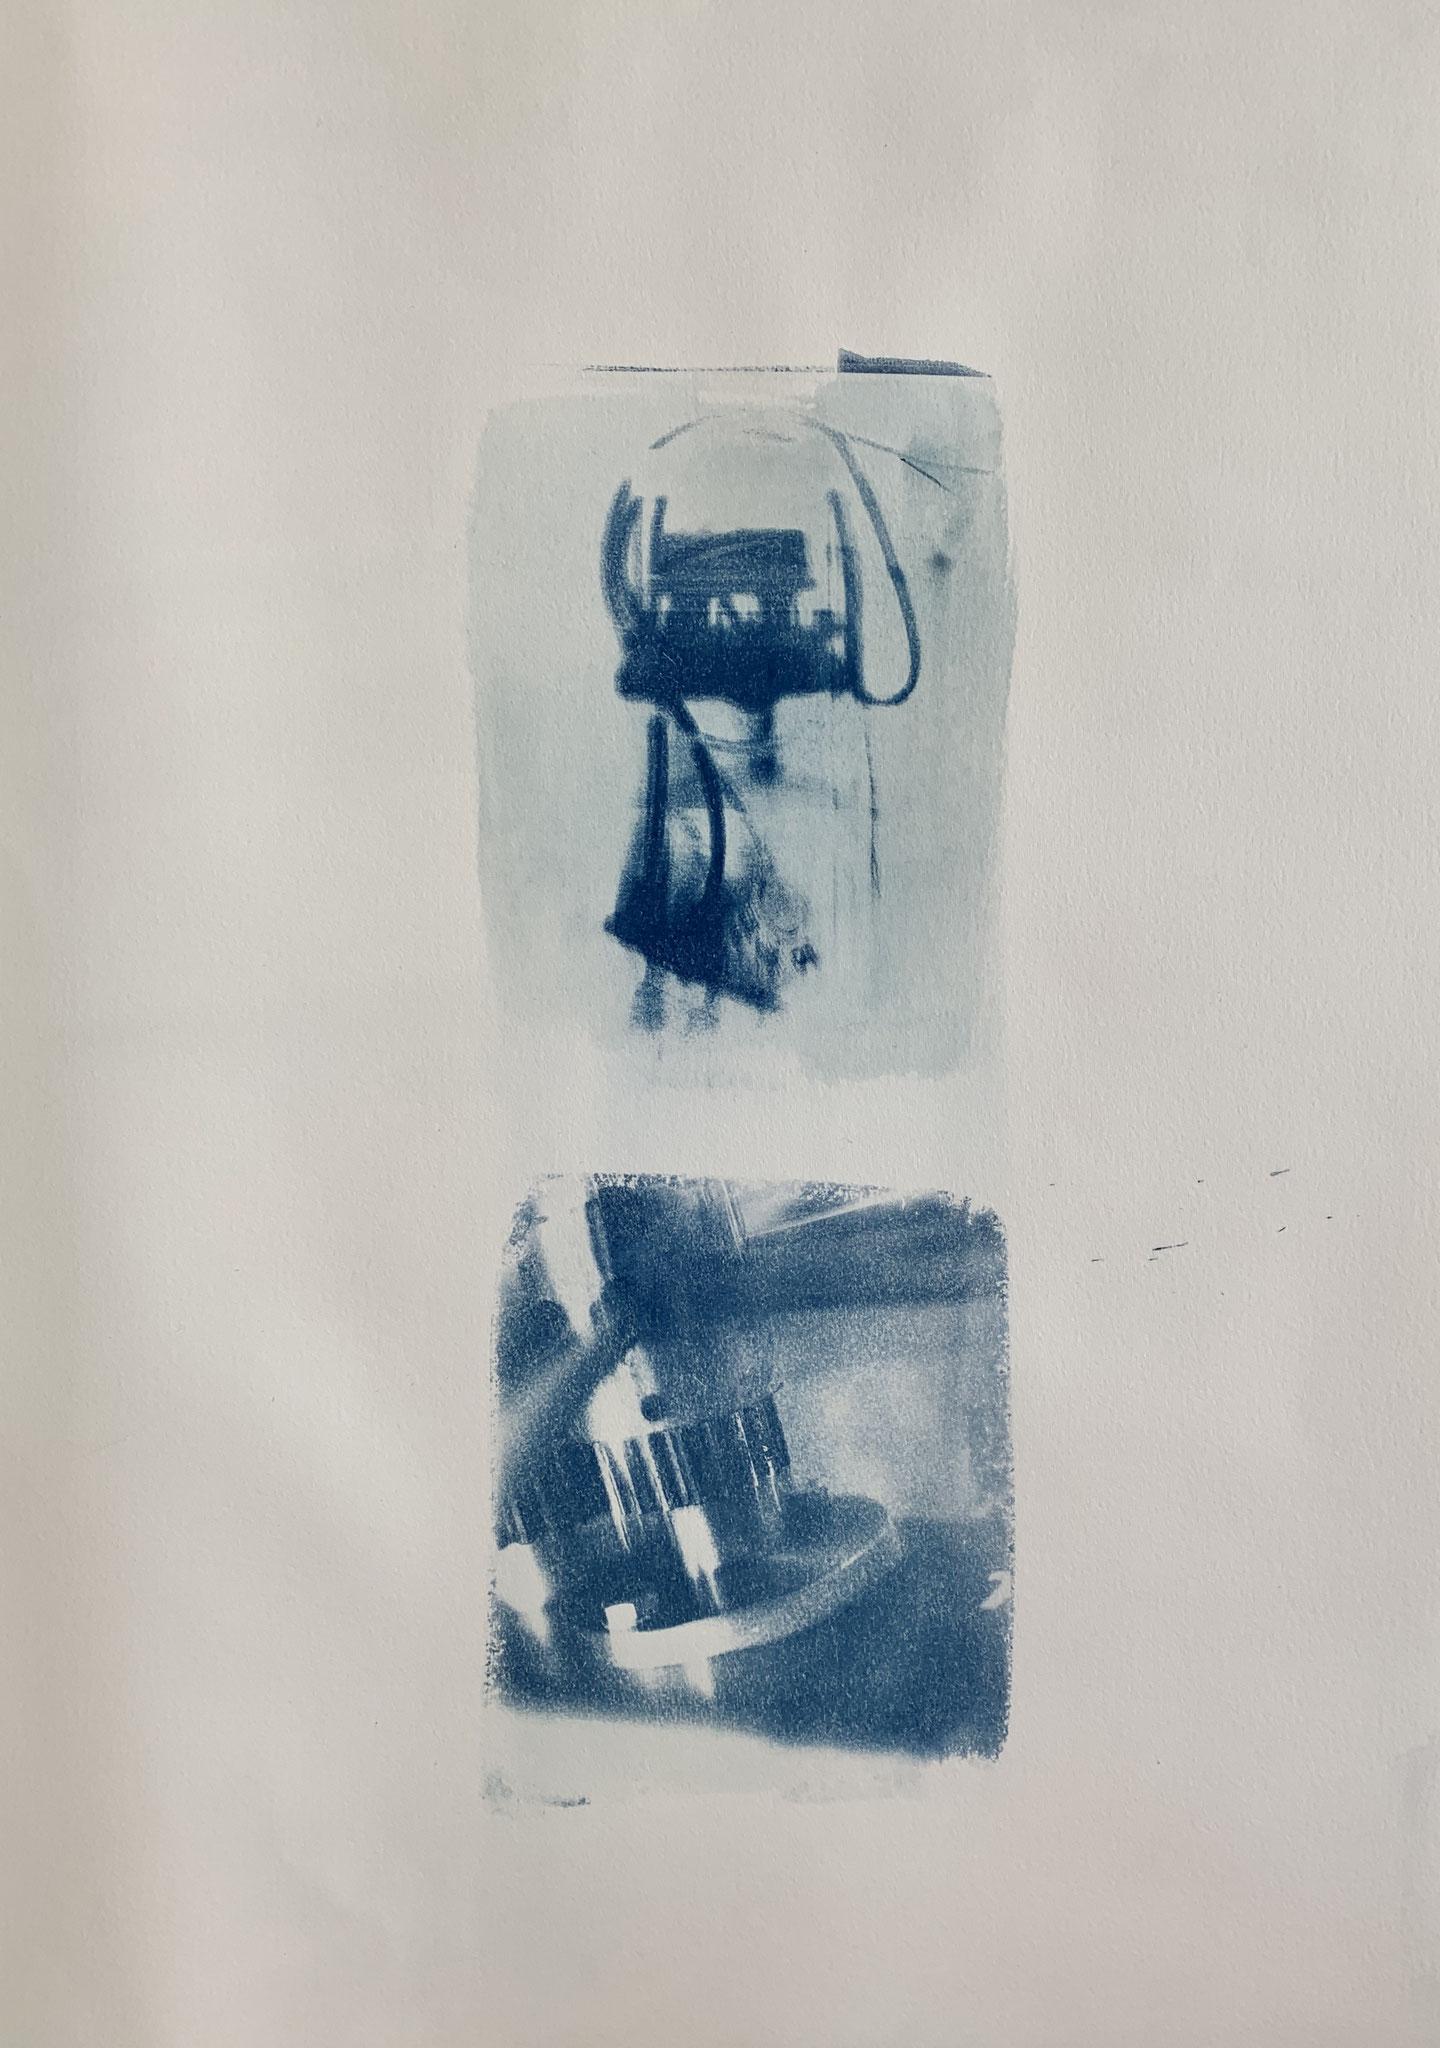 Lampus ex machina, Cyanotypie, 50 x 70 cm,  2020